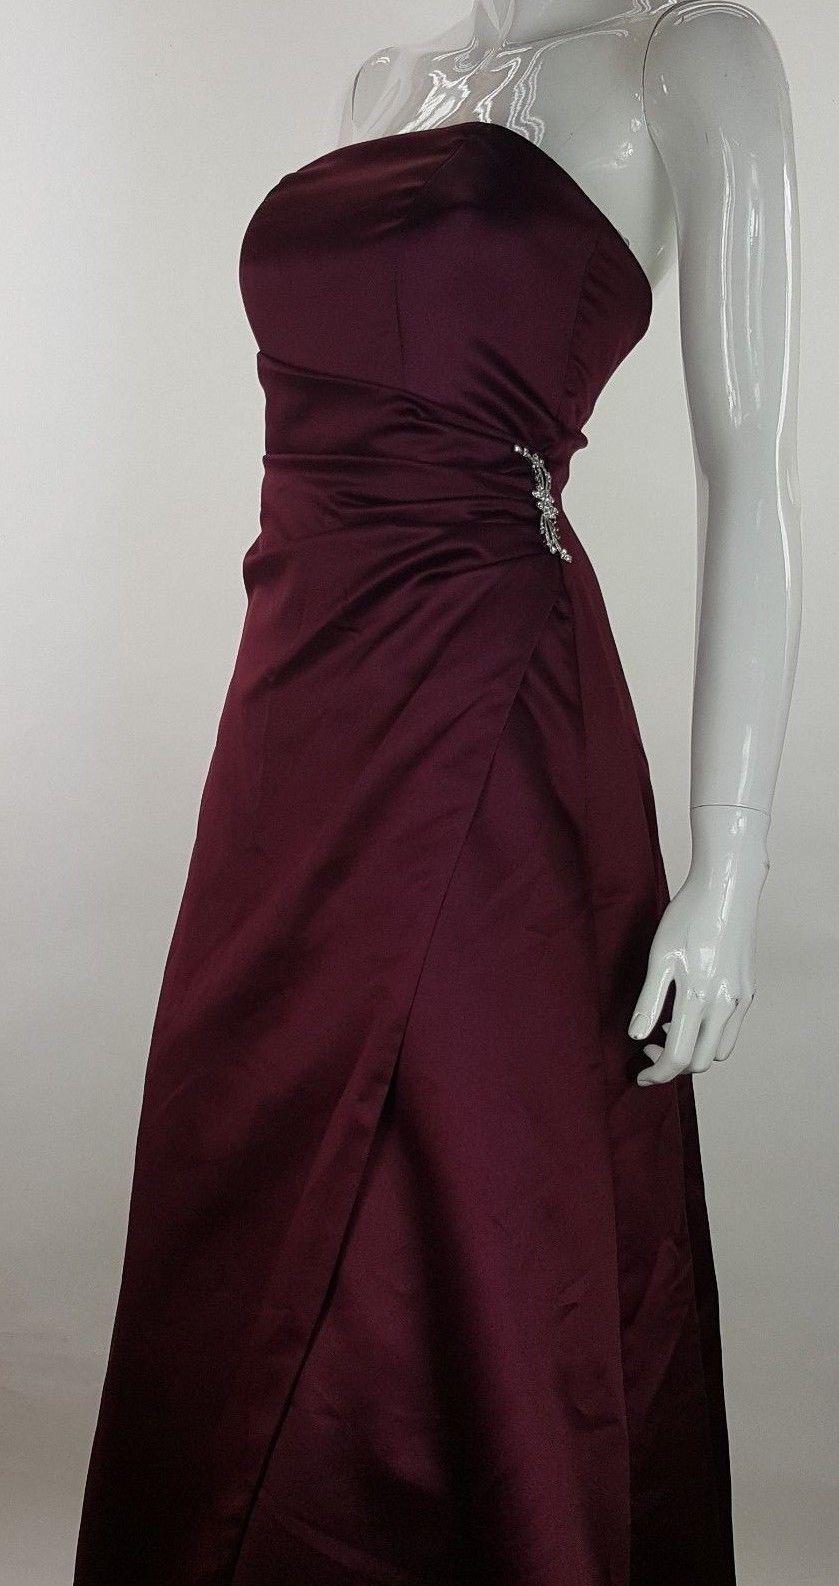 616f12bff70 Davids Bridal Sleeveless Ruched Long Formal Bridesmaid Dress Burgundy Size  4 EUC -  28.04